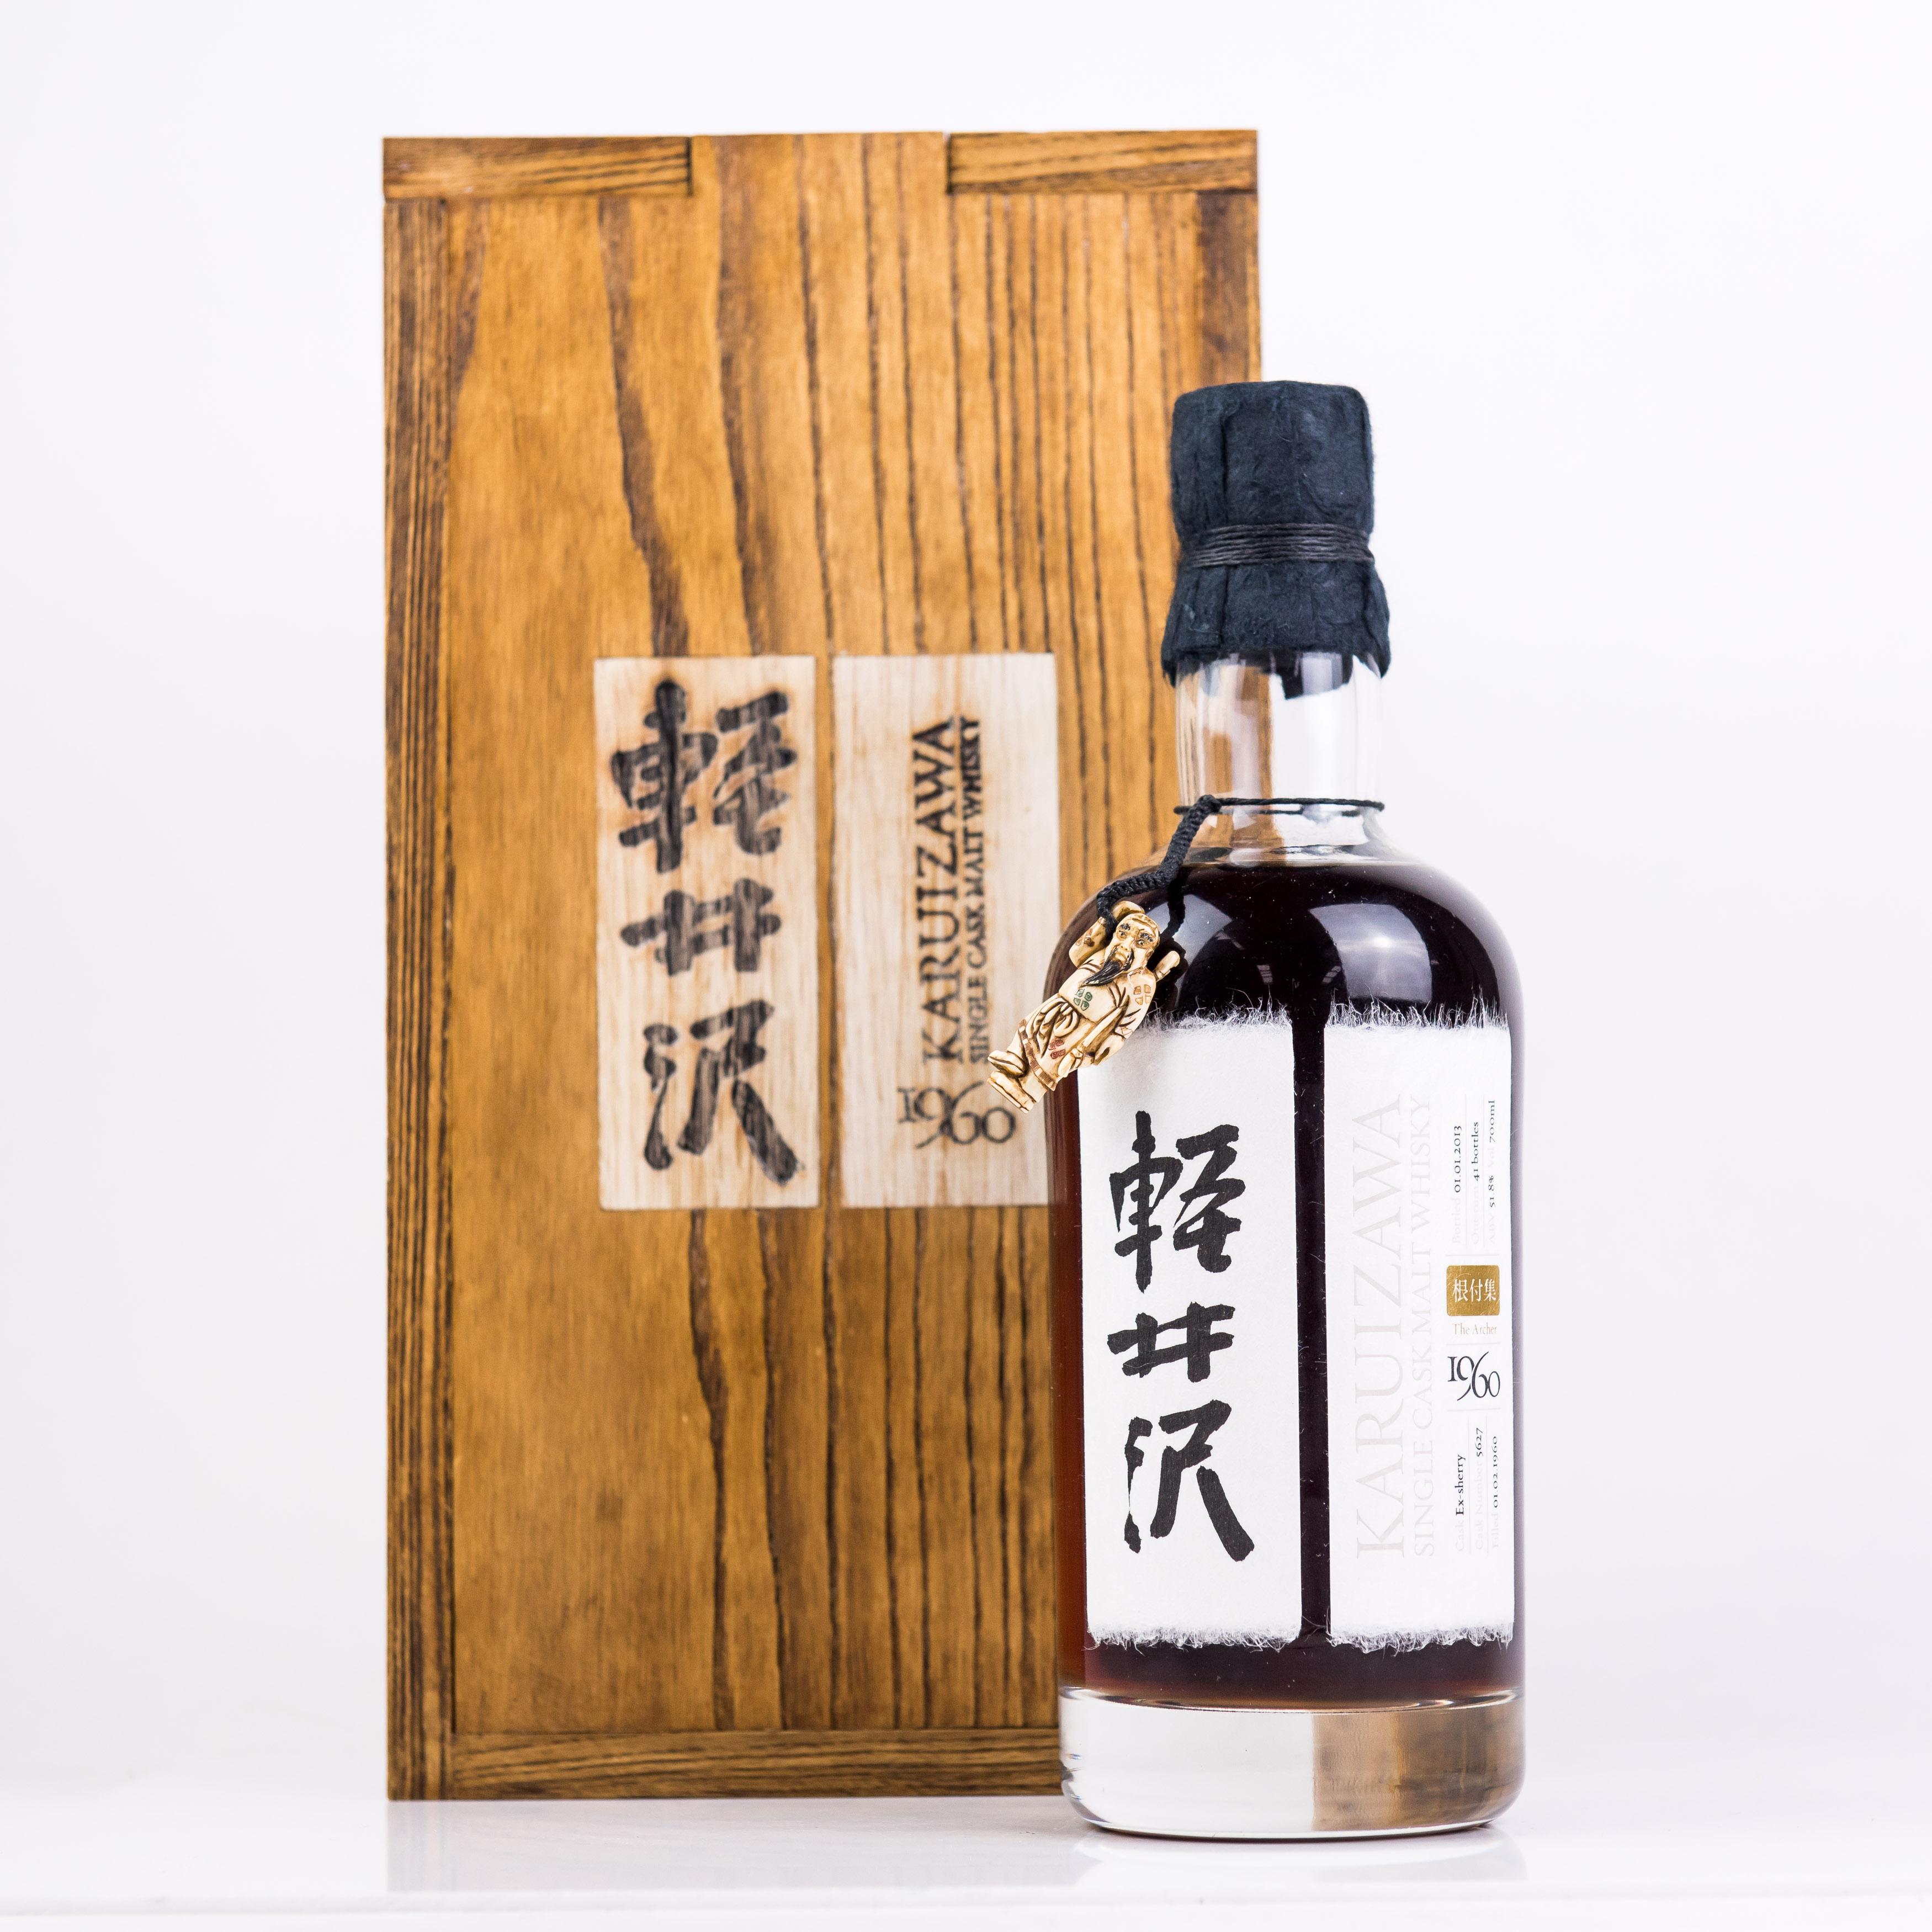 Karuizawa 1960 Single Cask #5627 / The Archer £100,100.00